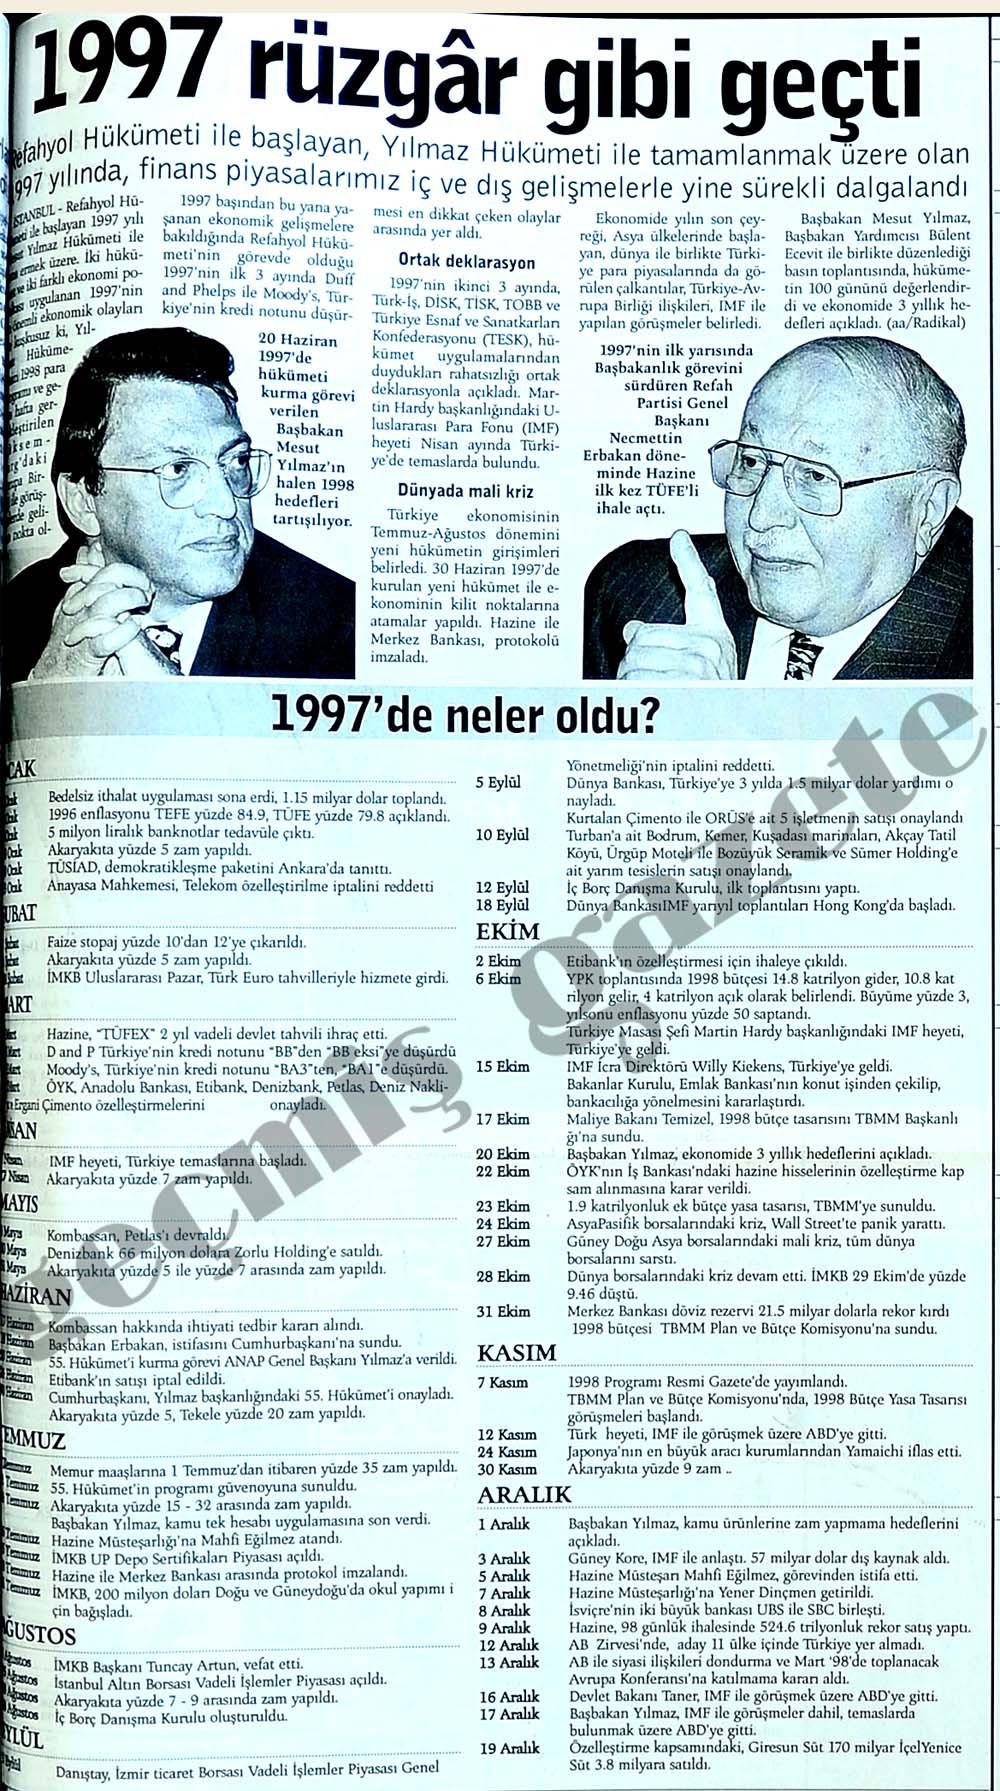 1997'de neler oldu